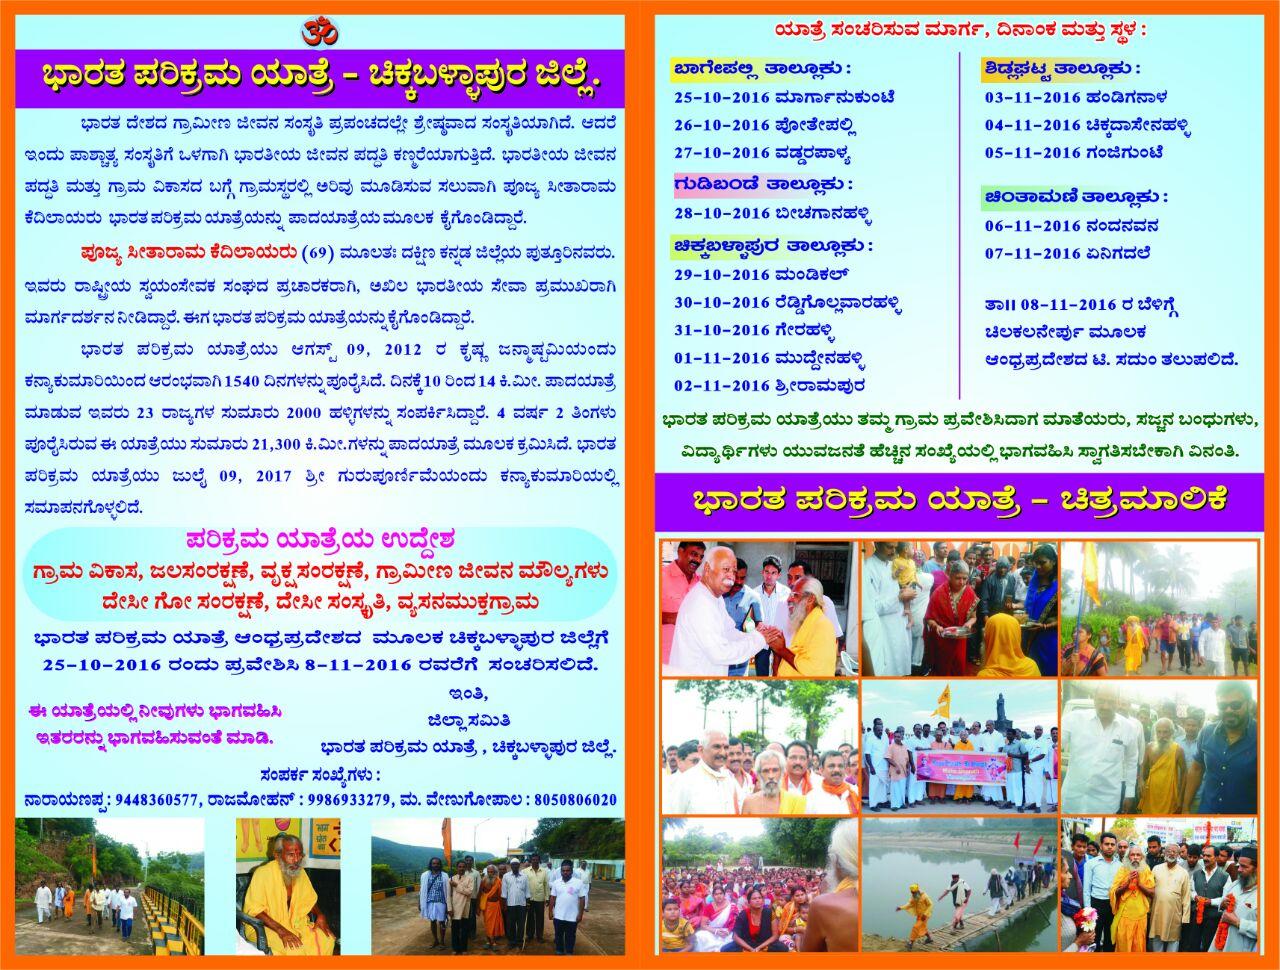 bharat-parikrama-yatra-karnataka-october-25-2016-4